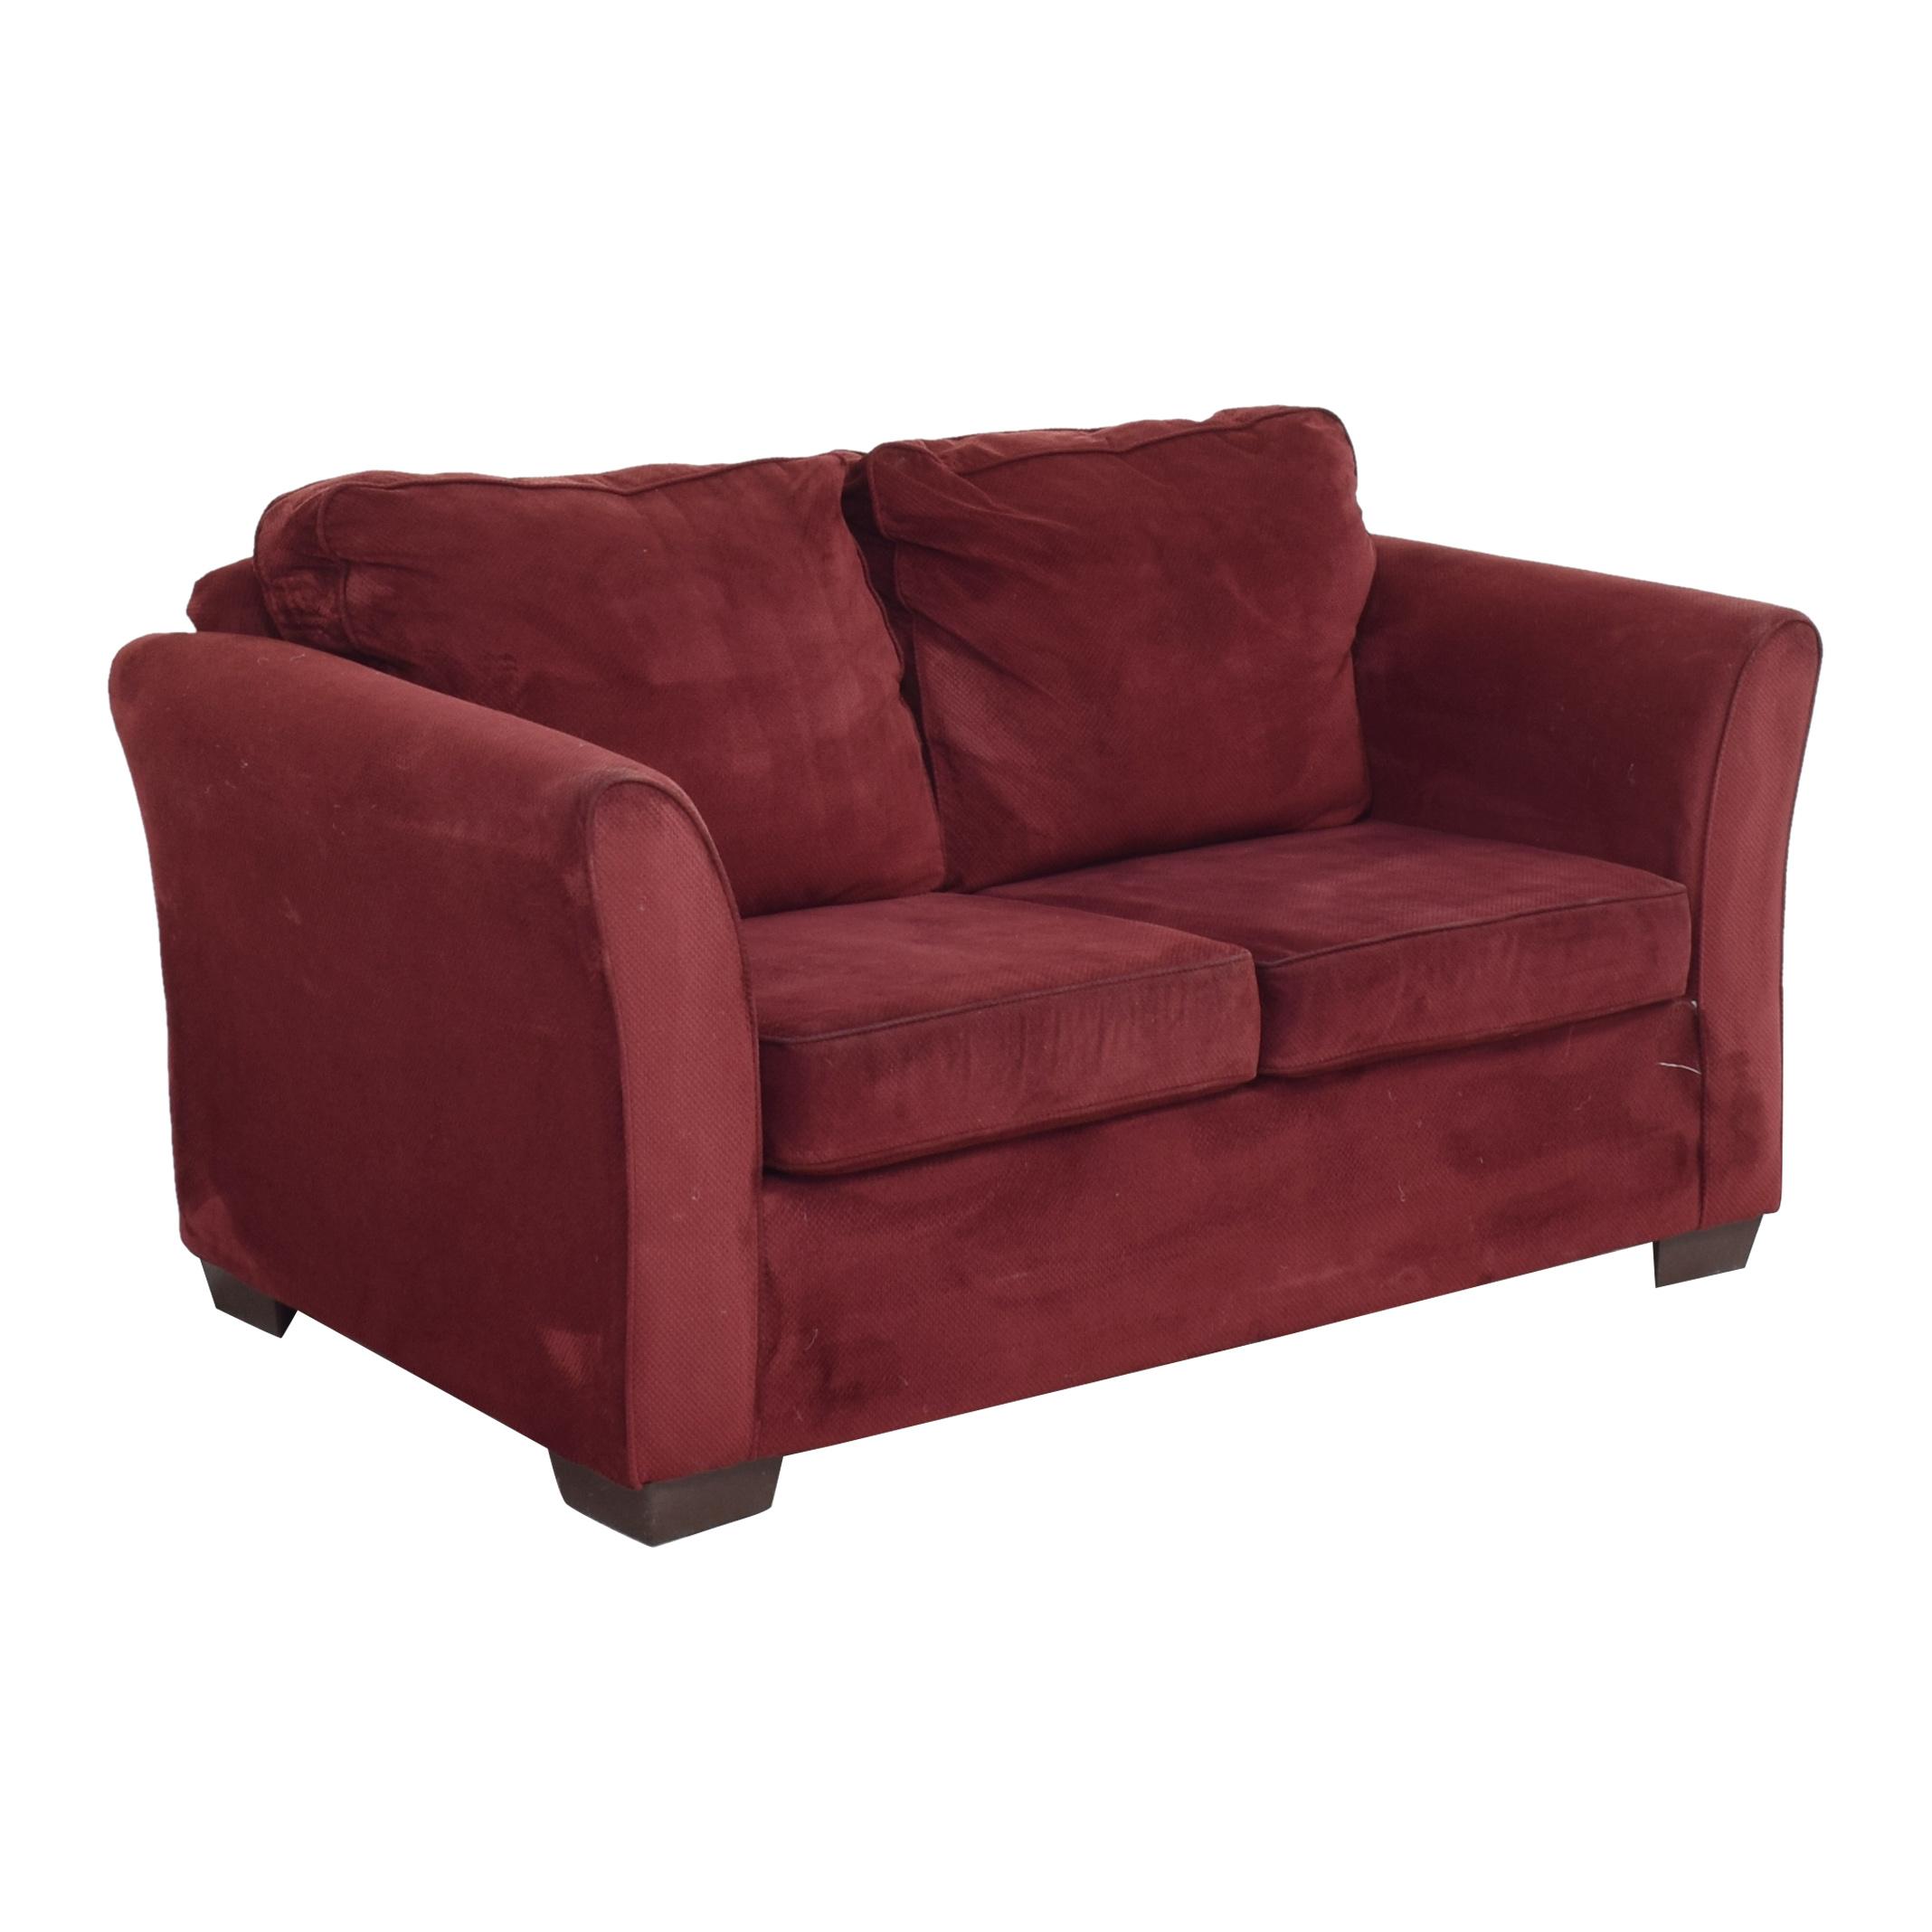 shop United Furniture United Furniture by Simmons Malibu Wine Loves online